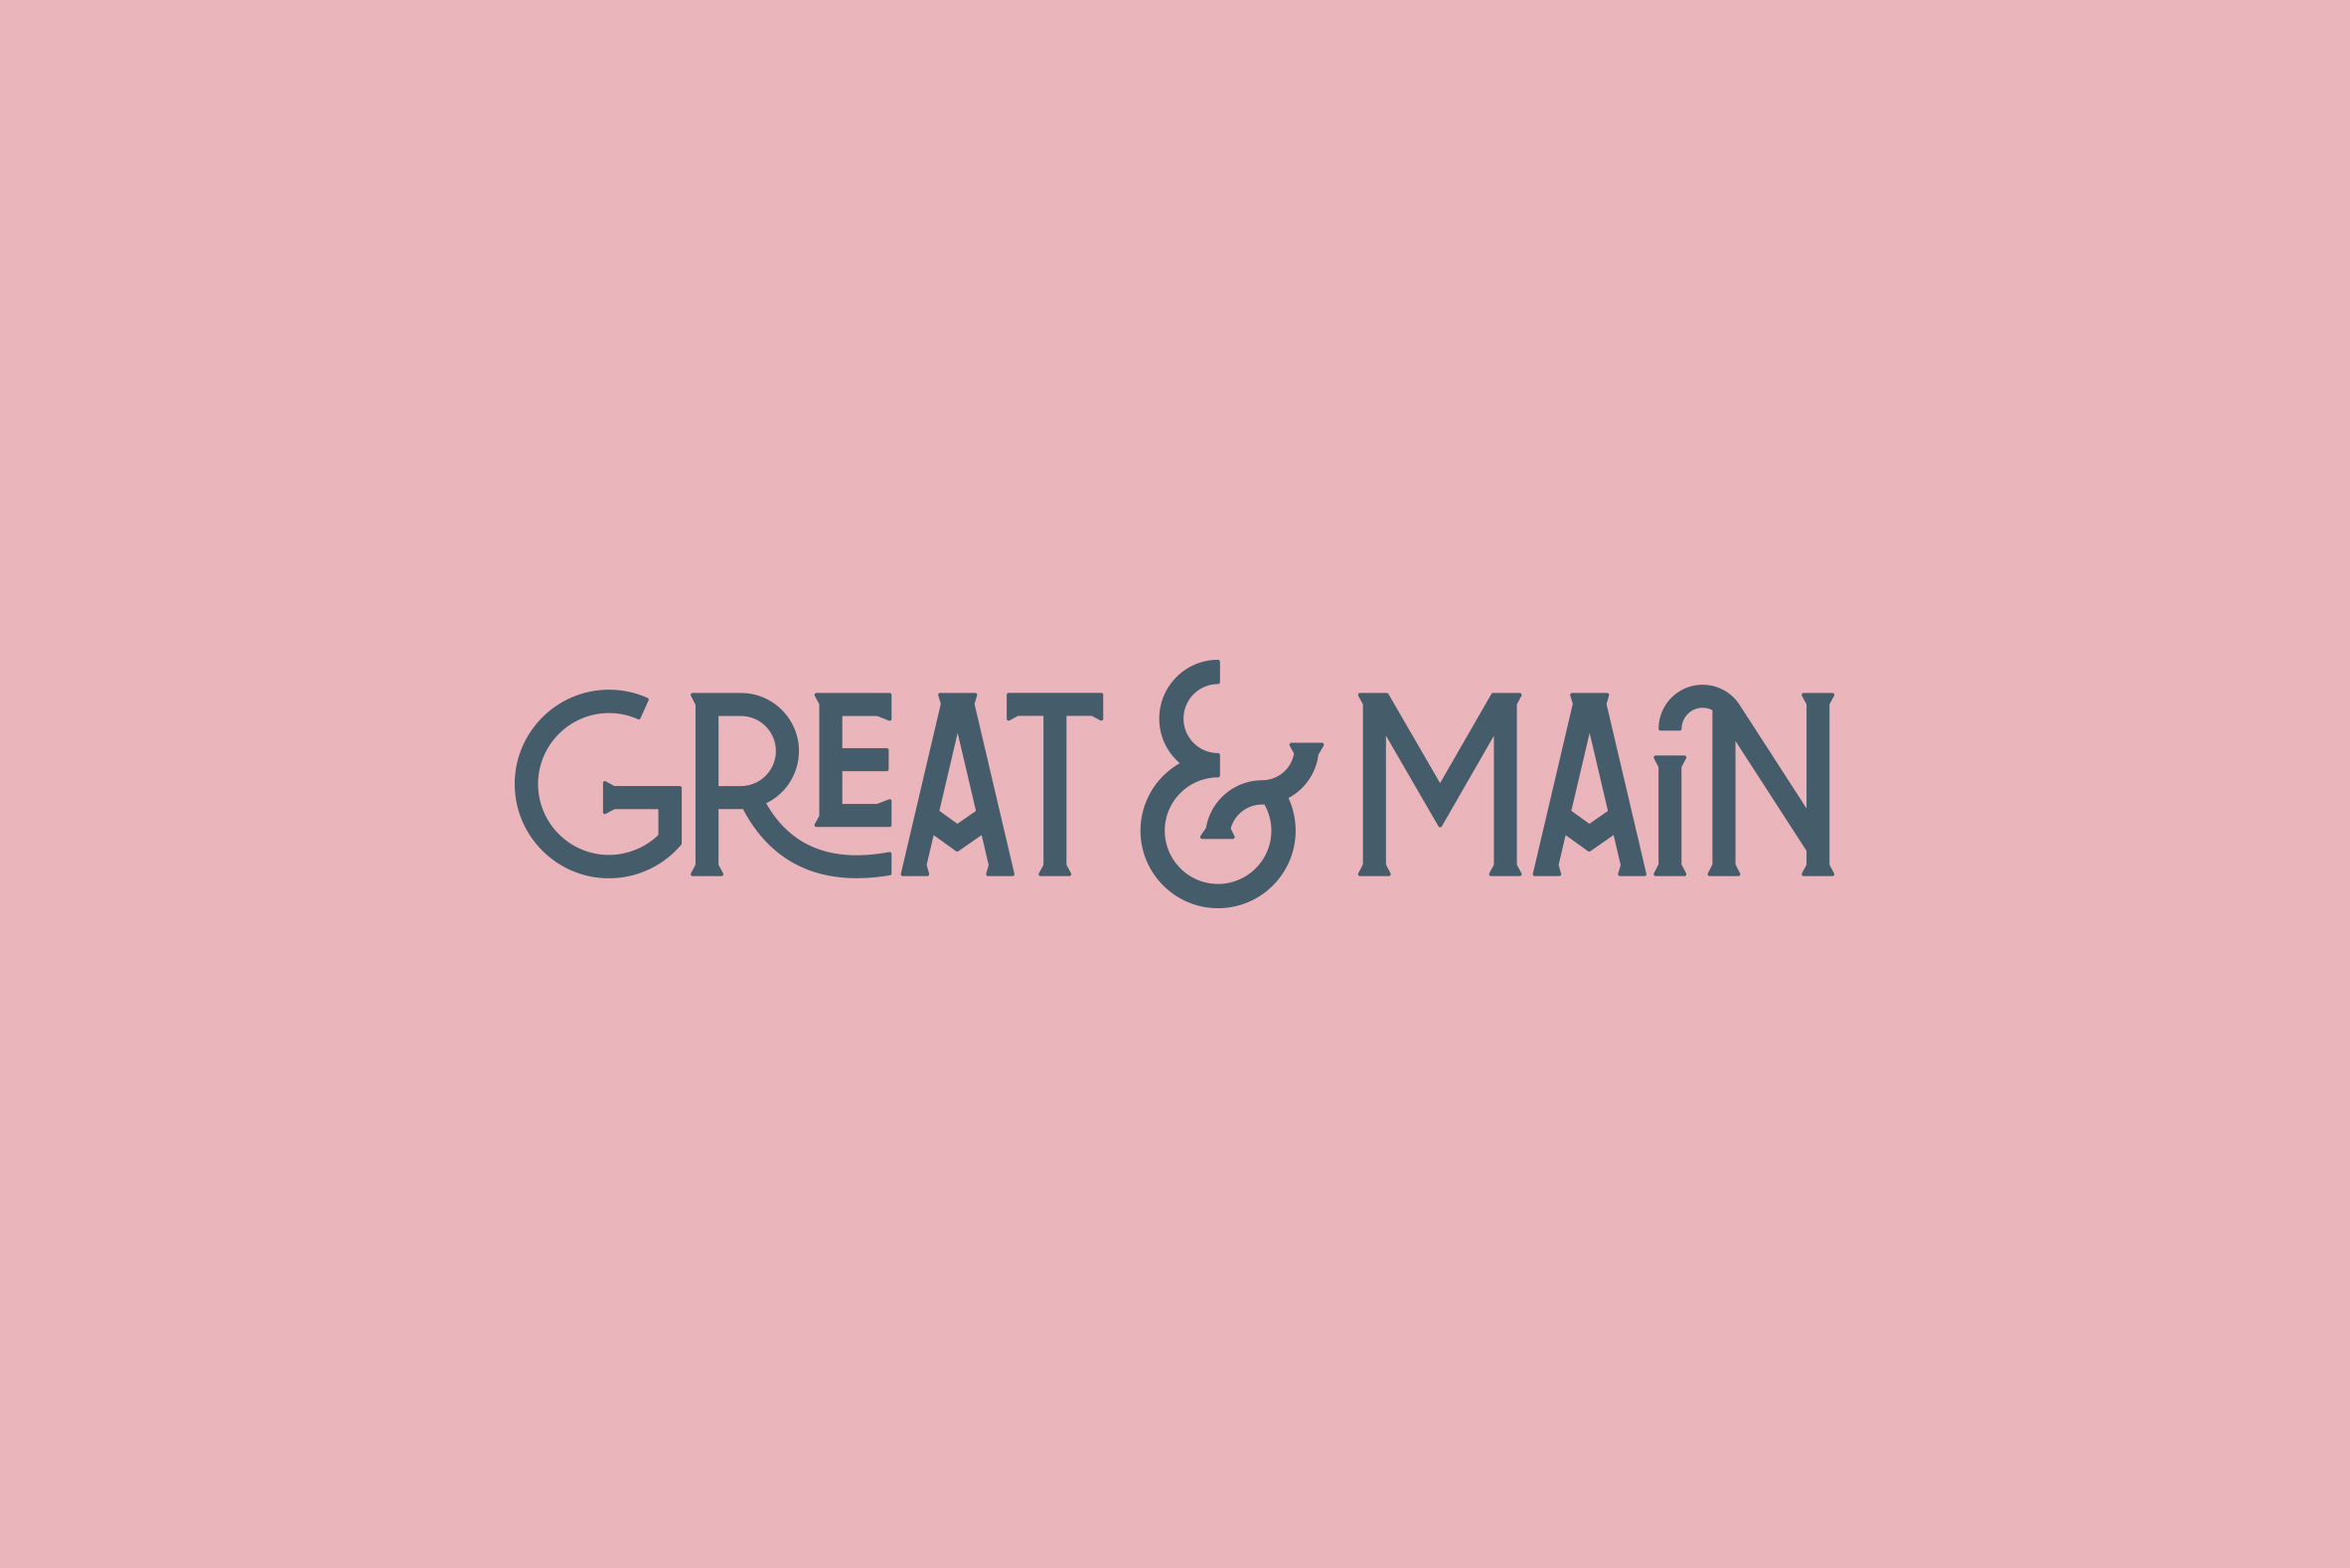 Great & Main